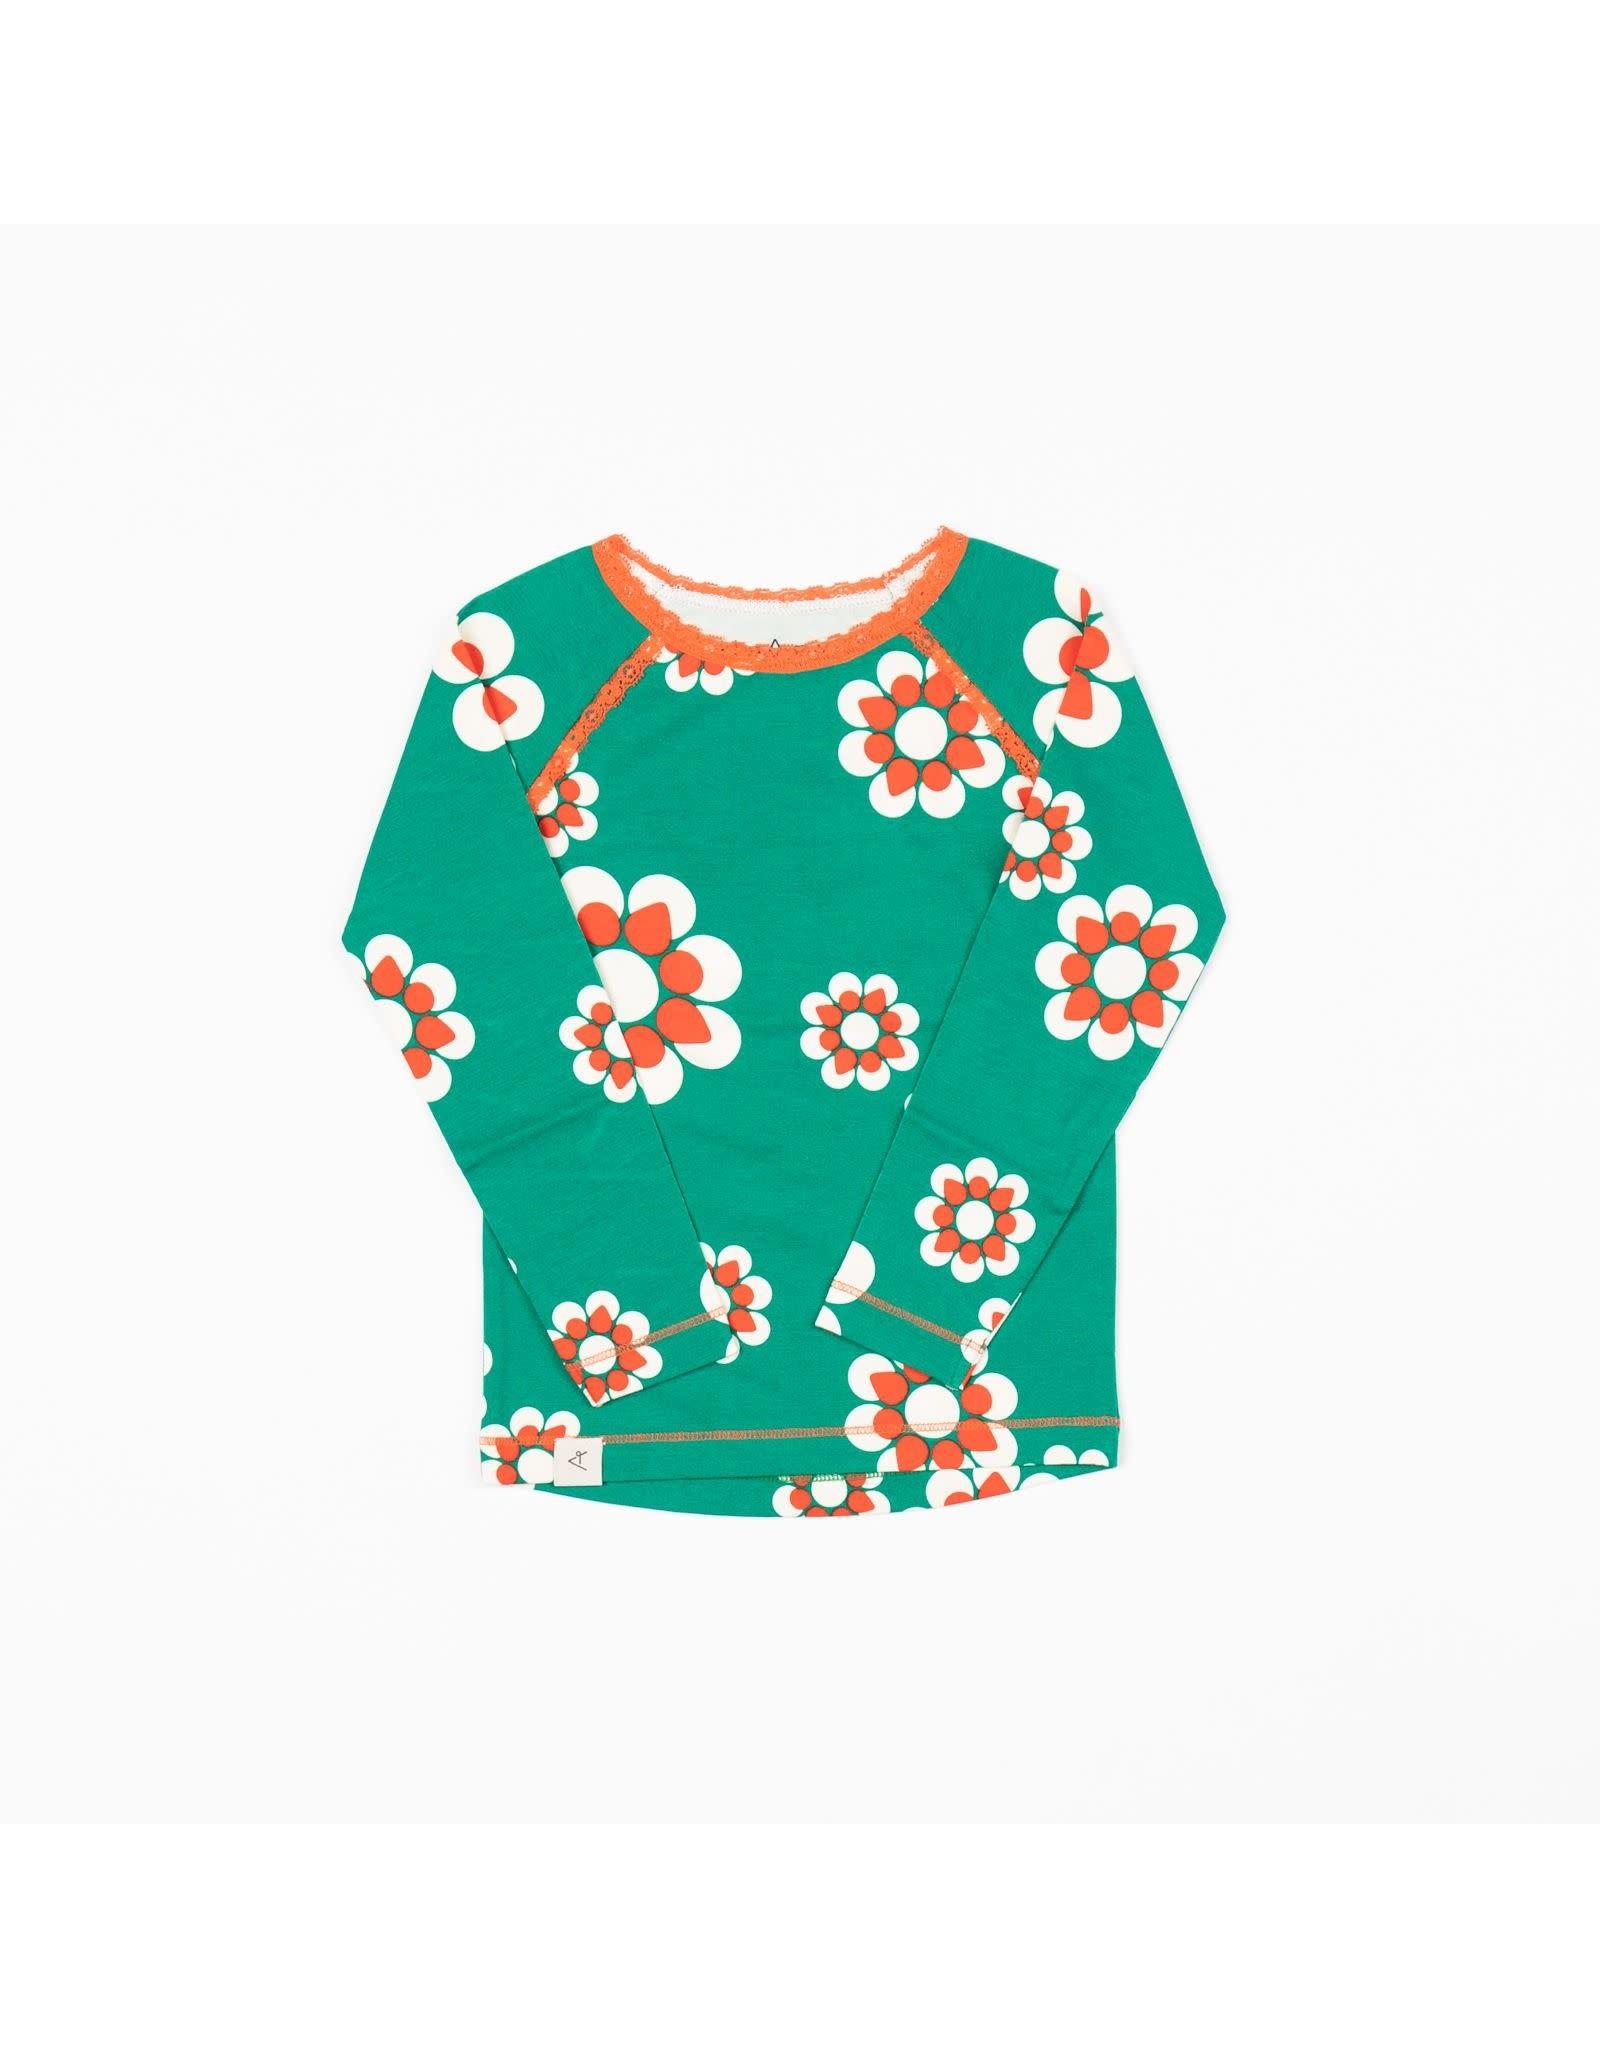 ALBA of Denmark Groene retro t-shirt met wit/oranje bloemen